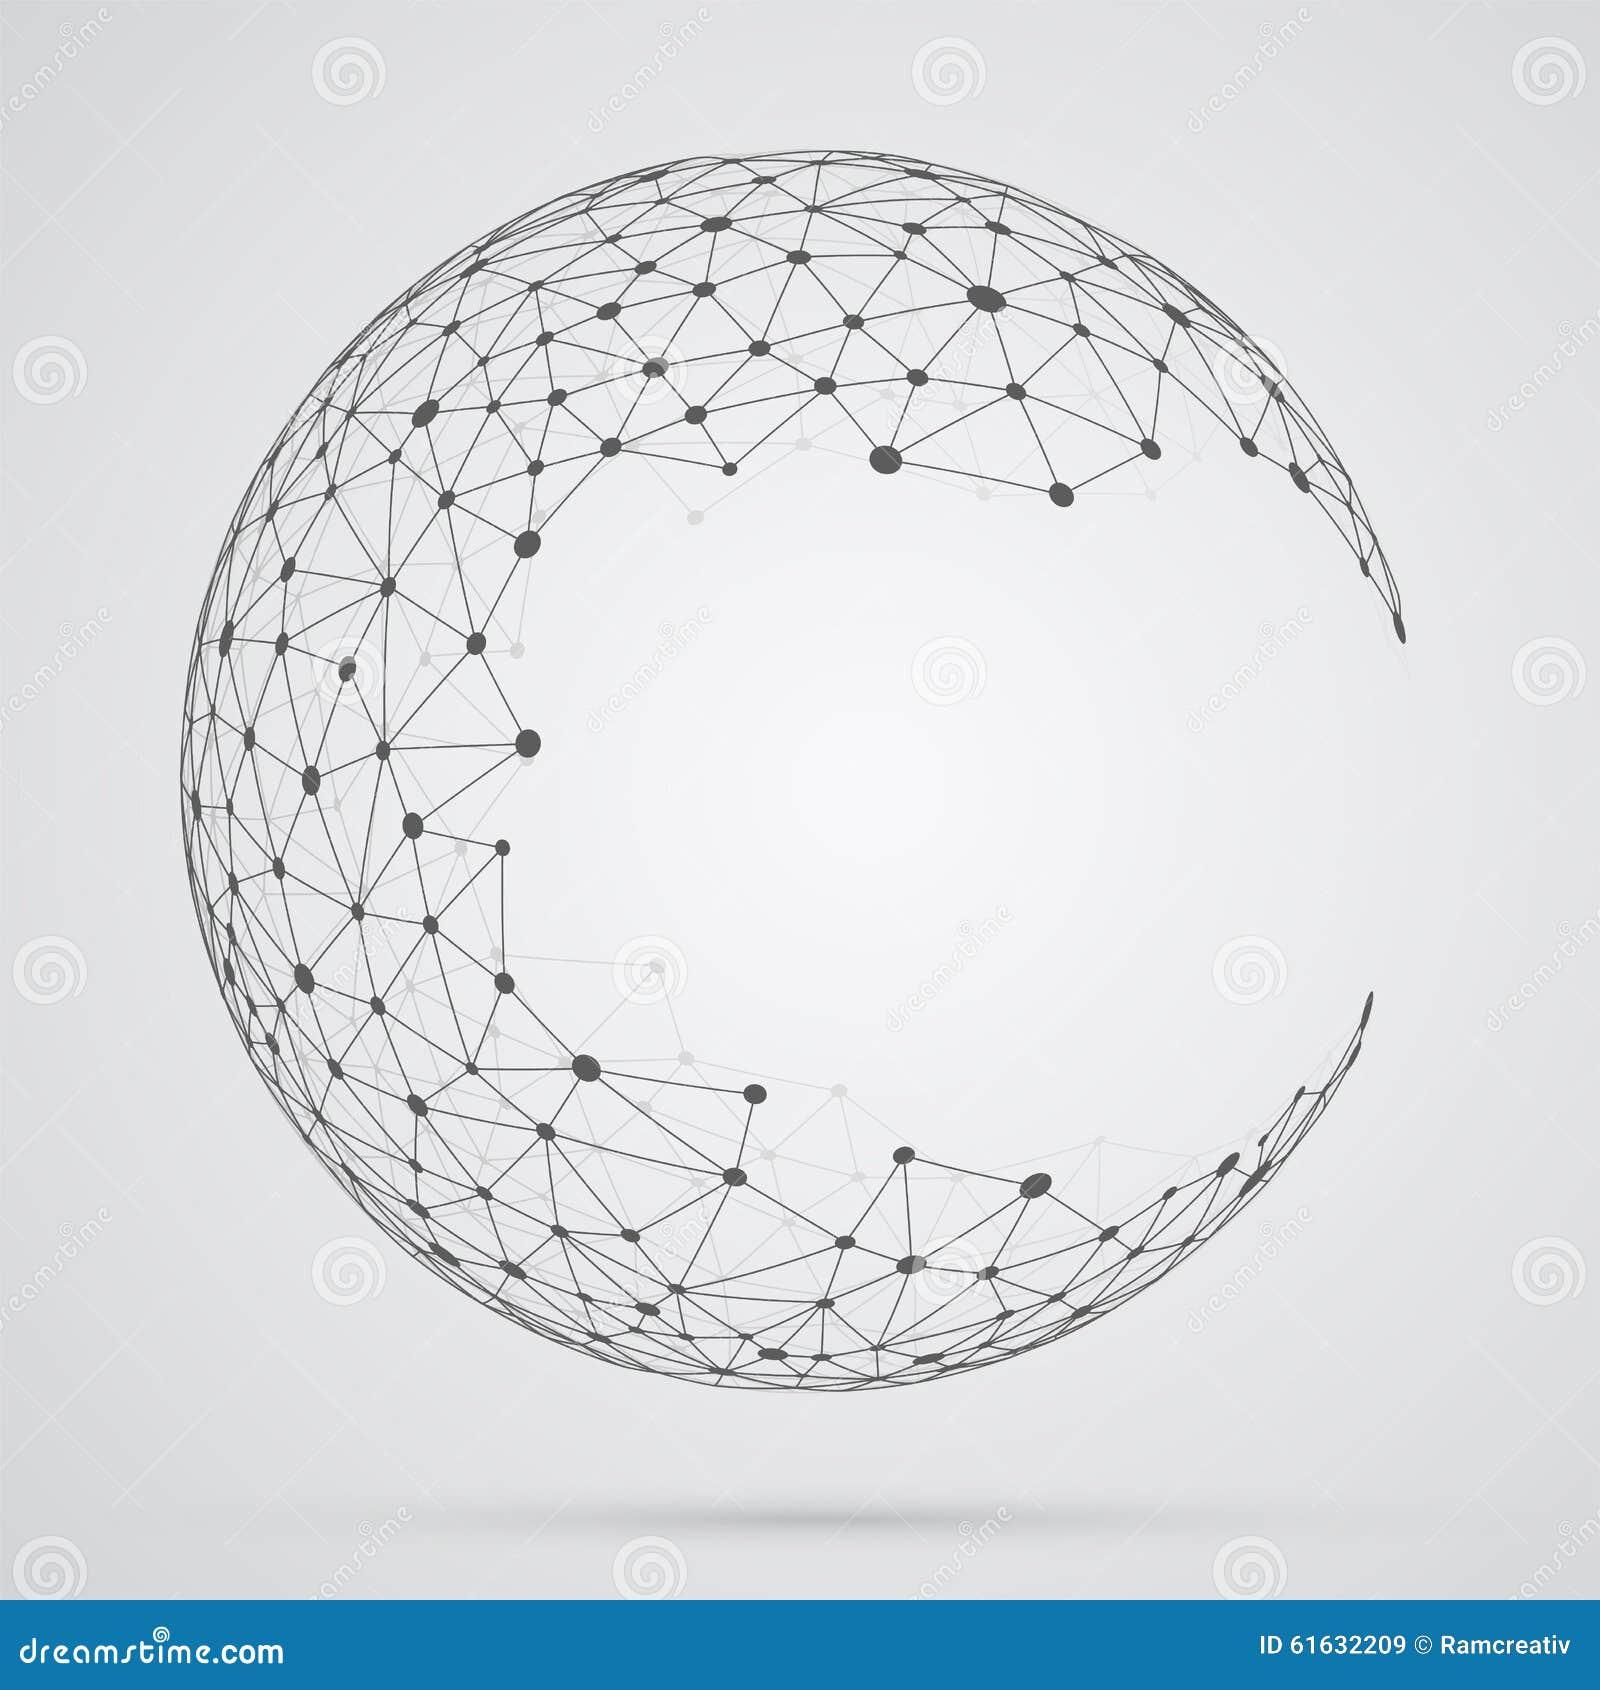 Global mesh sphere. Abstract geometric shape